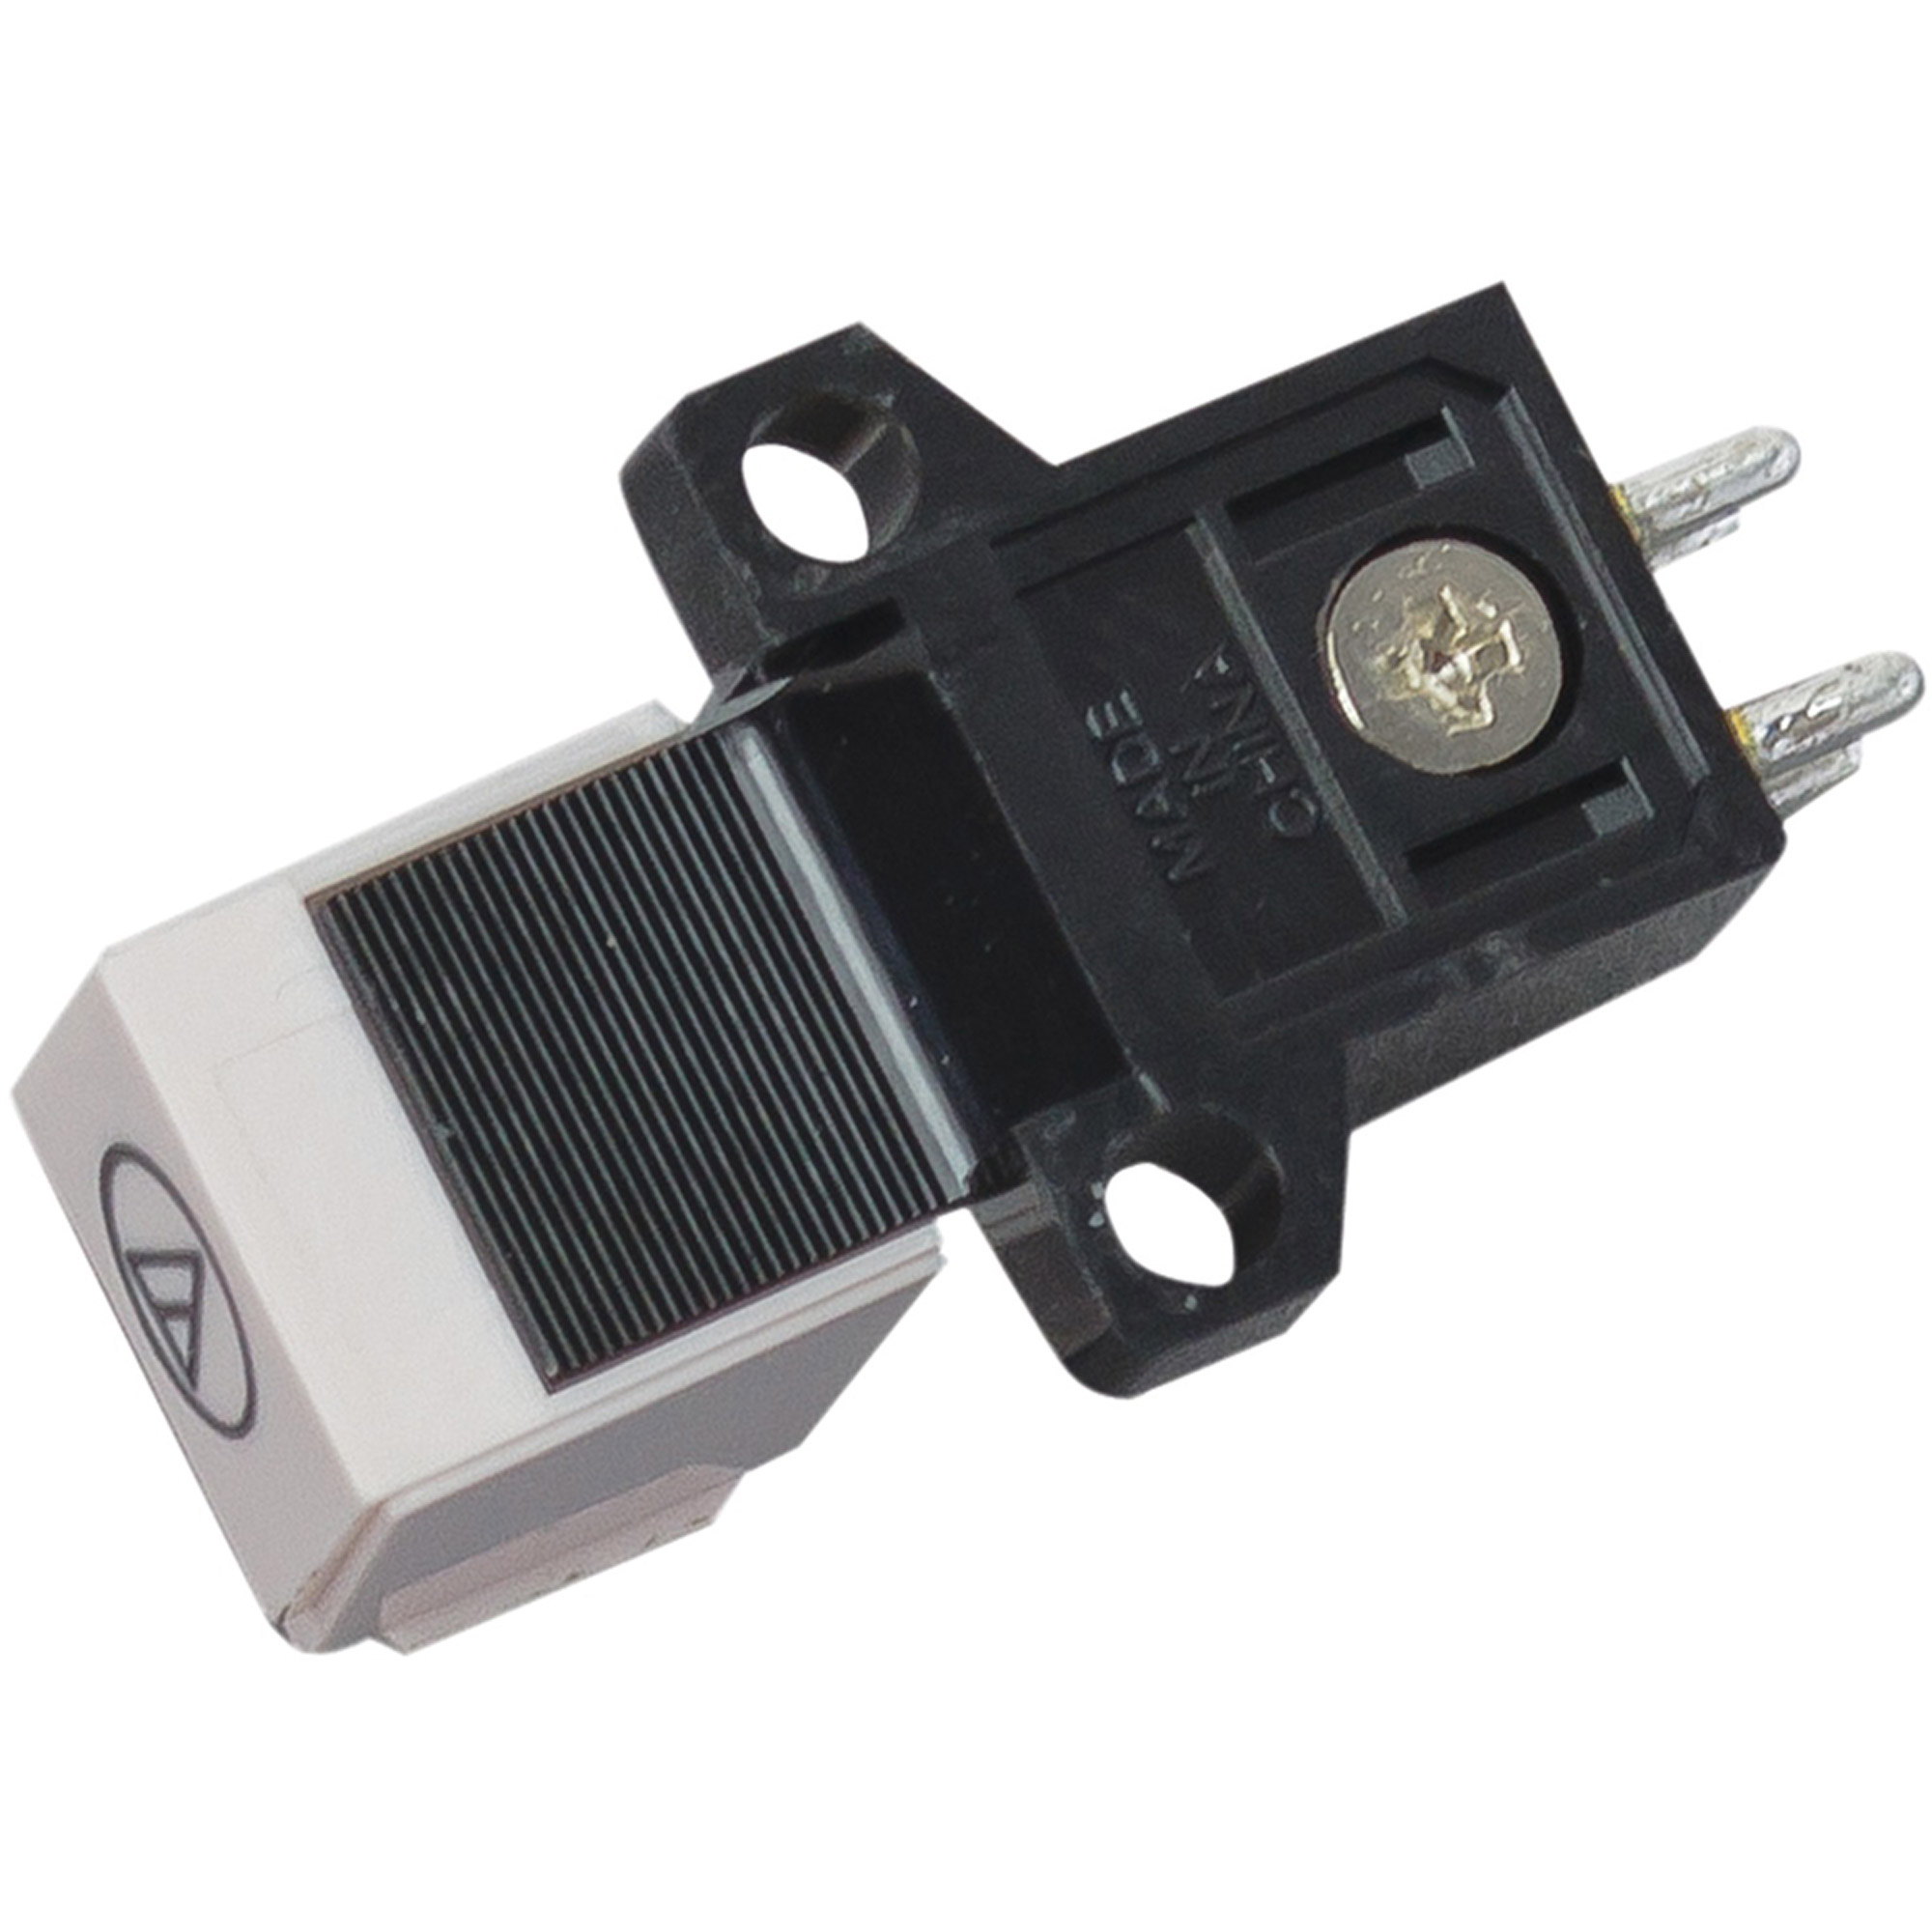 Gemini CN-15 Stereo Cartridge and Stylus by Gemini